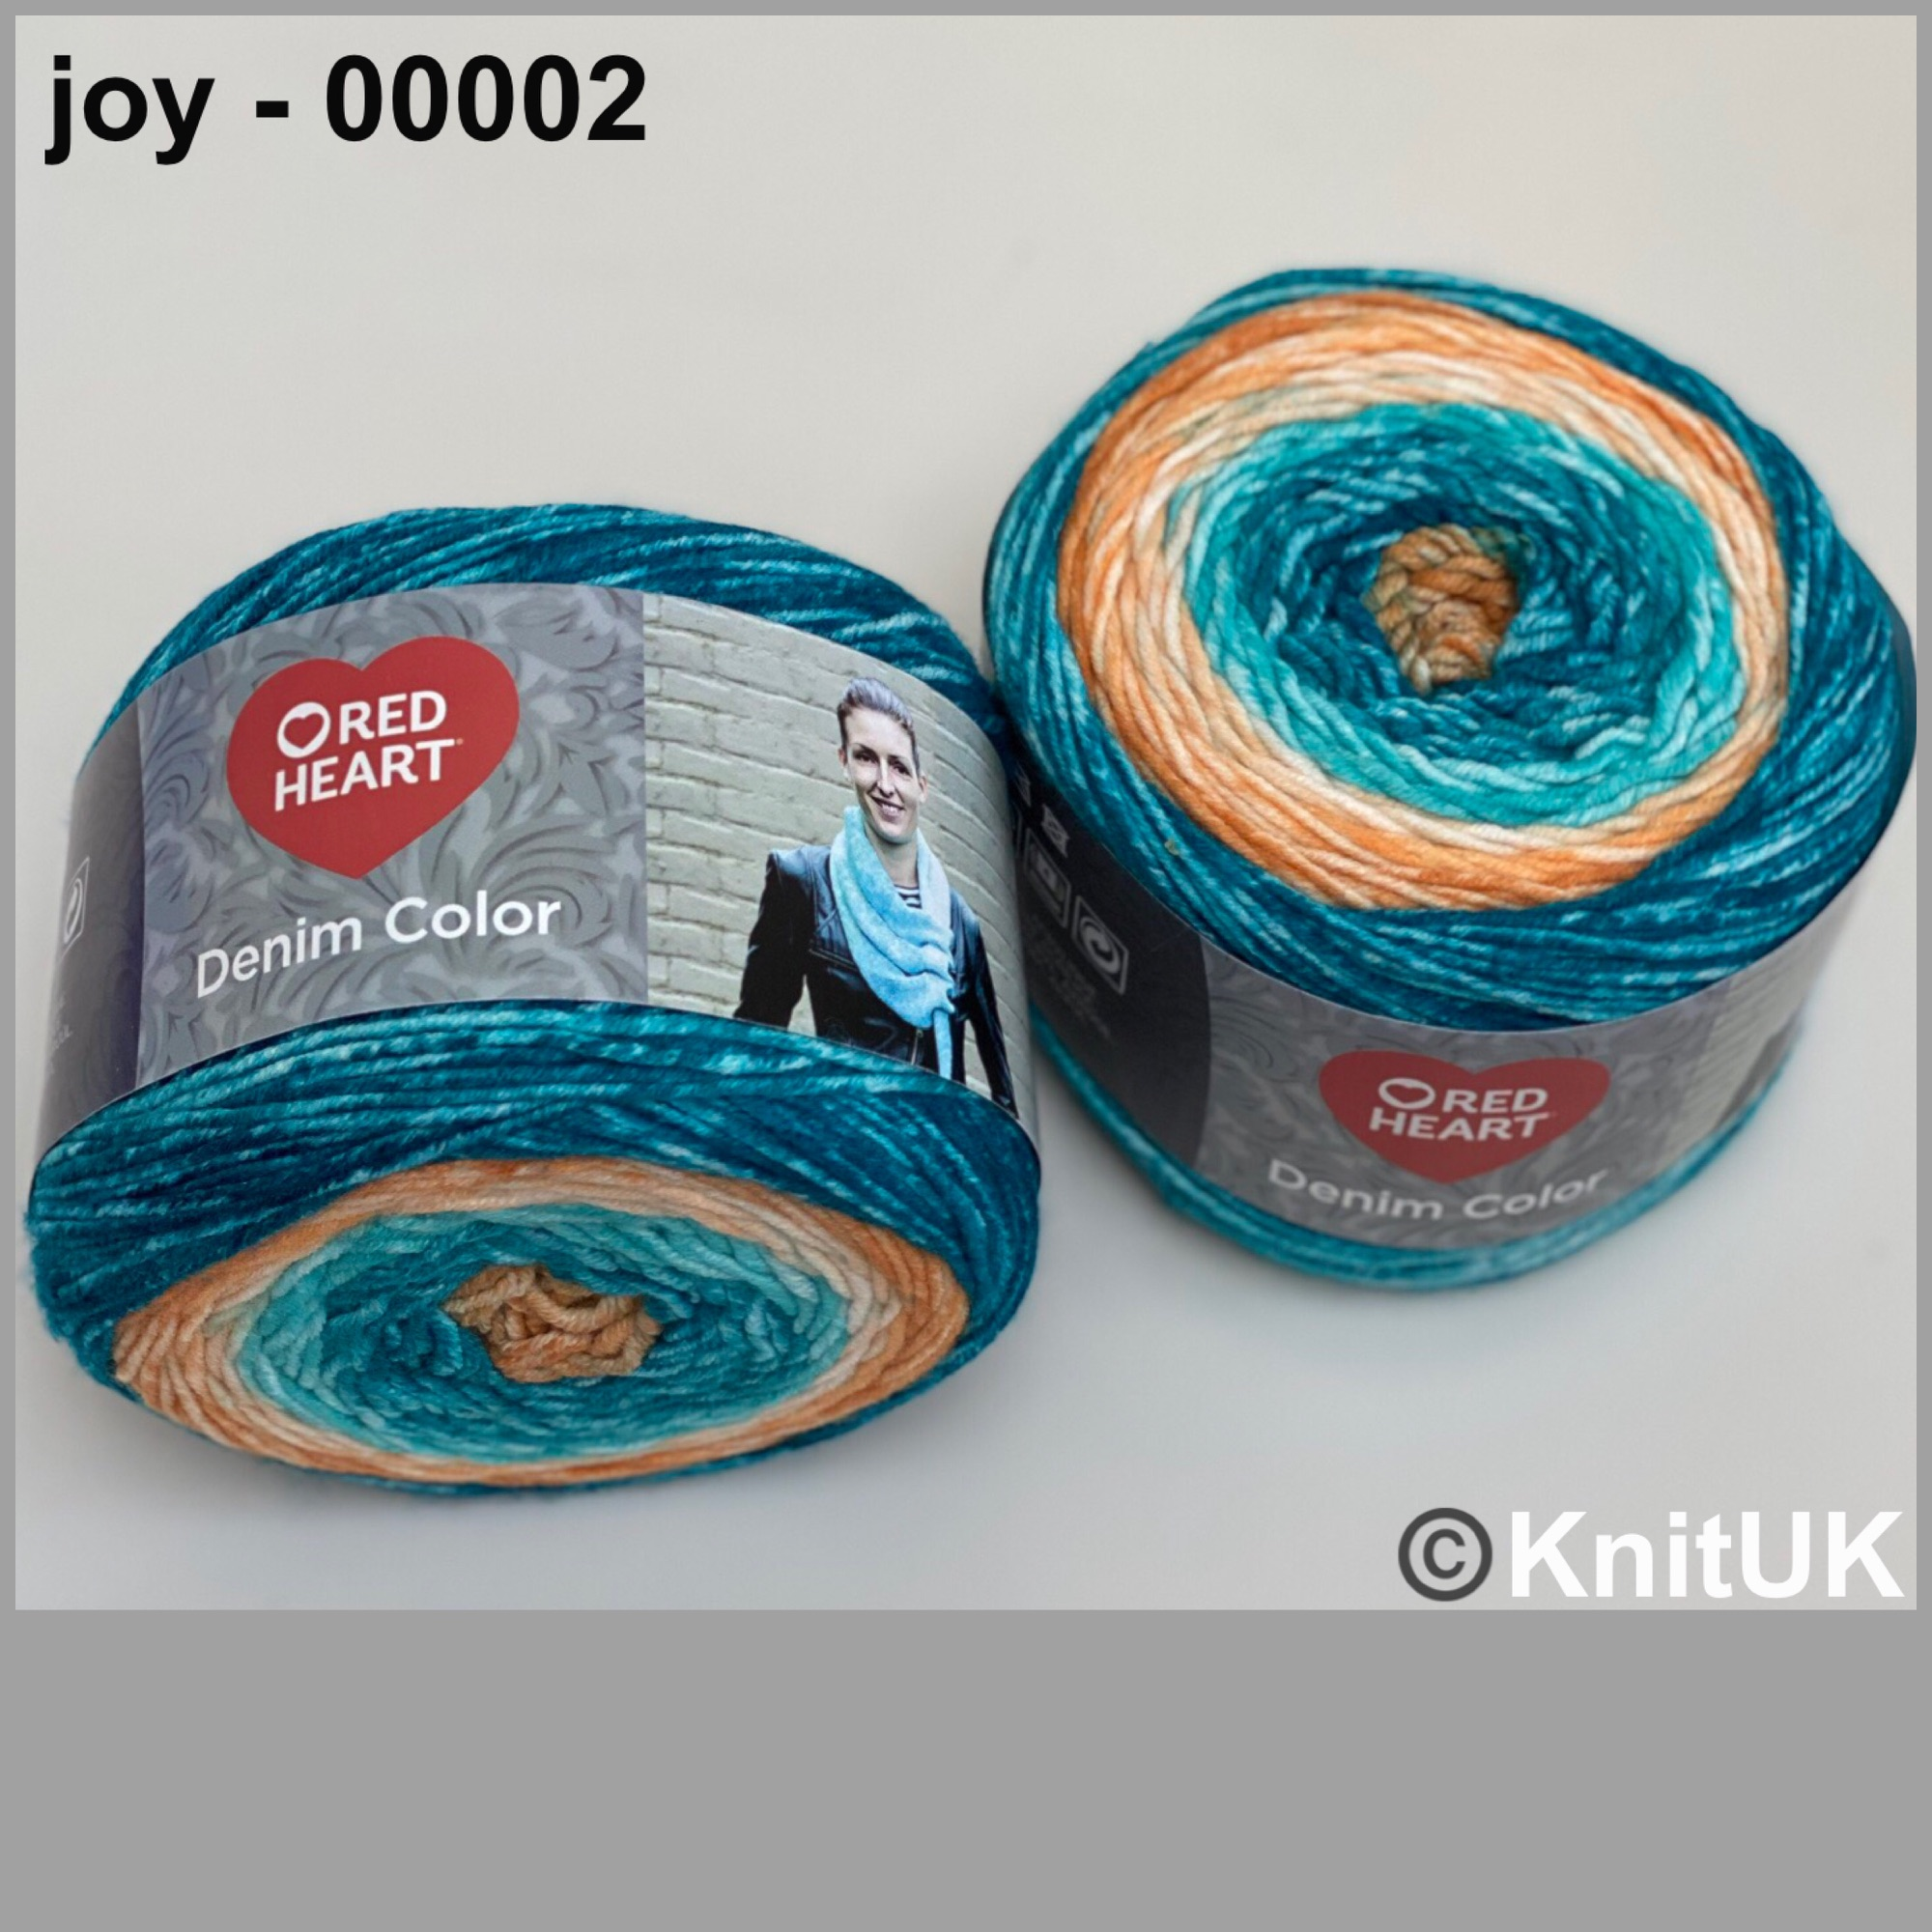 Red heart denim color joy colour acrylic yarn loom knitting crochet